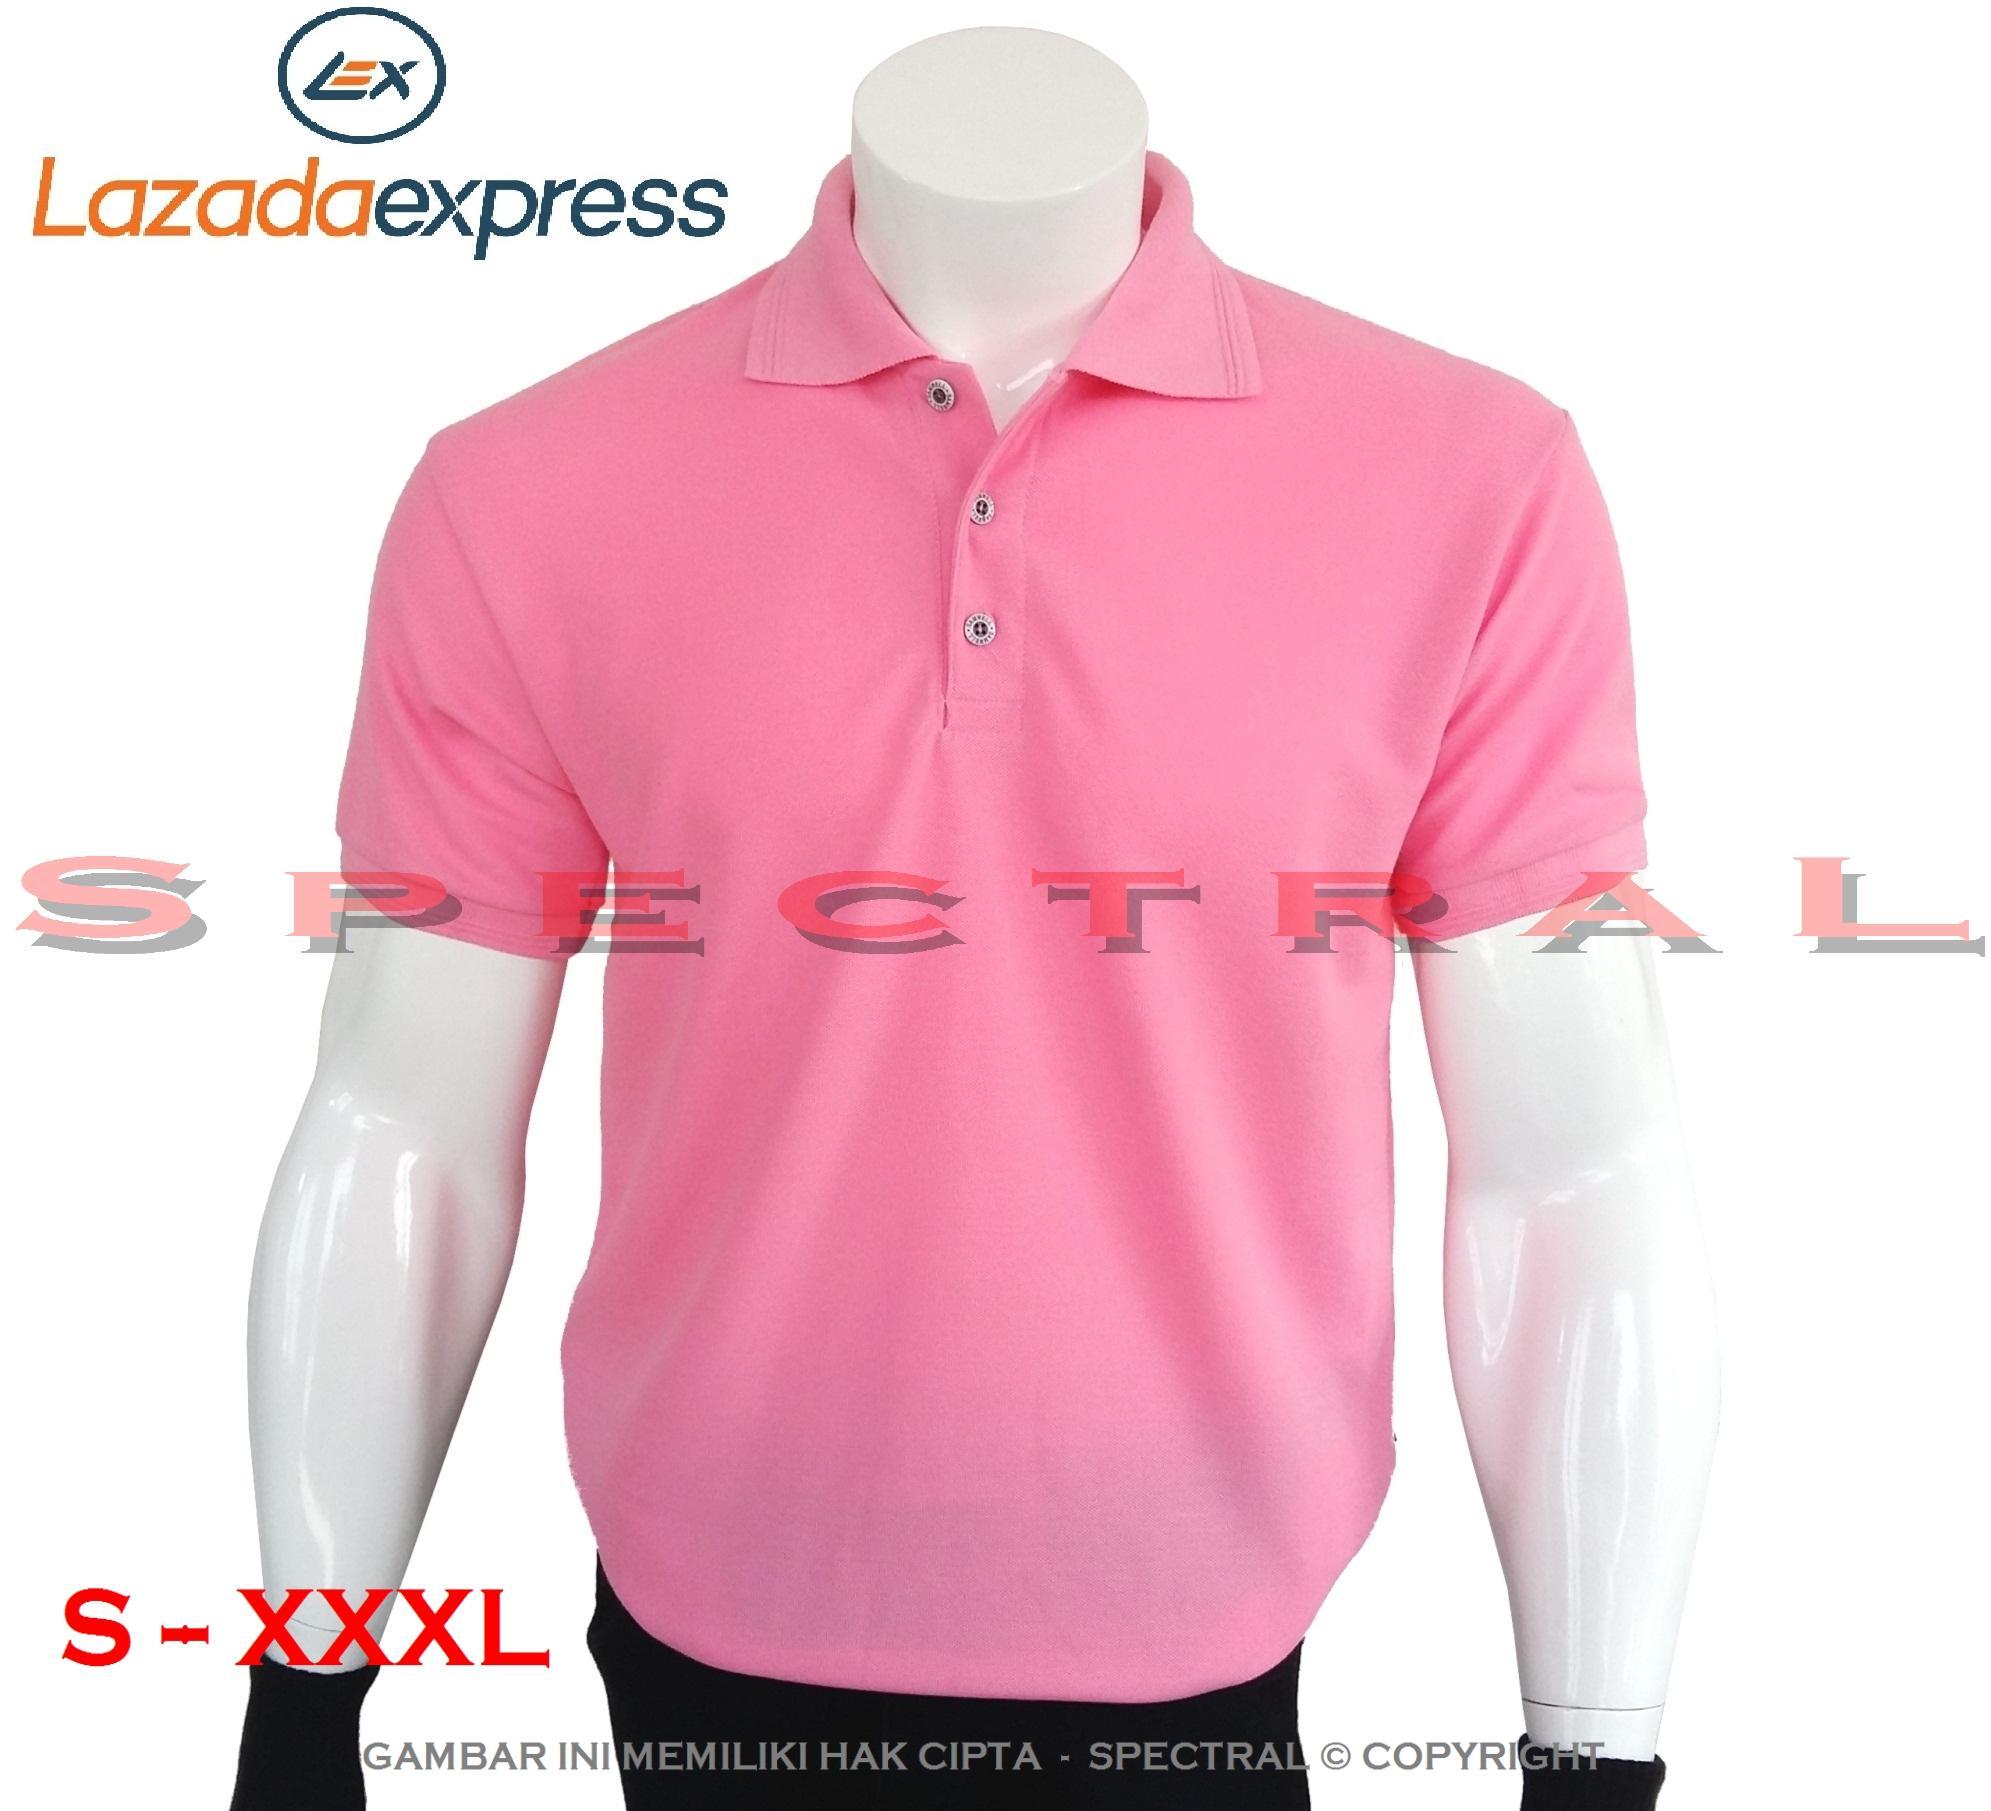 Spectral – 22 WARNA S M L XL XXL XXXL 2L 3L Polo Shirt Kaos Distro T